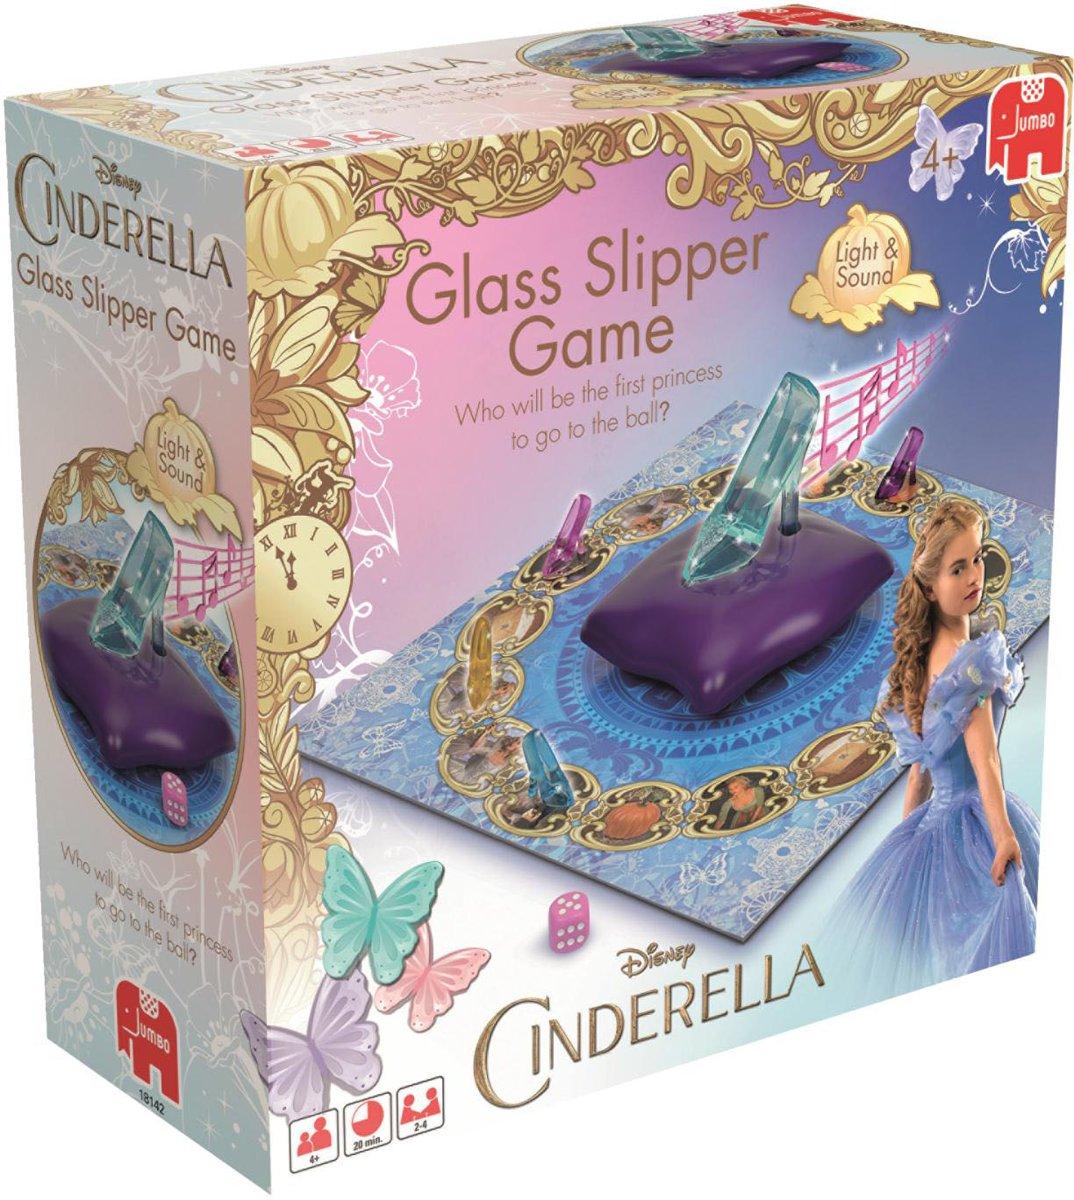 Cinderella Glass Slipper Game